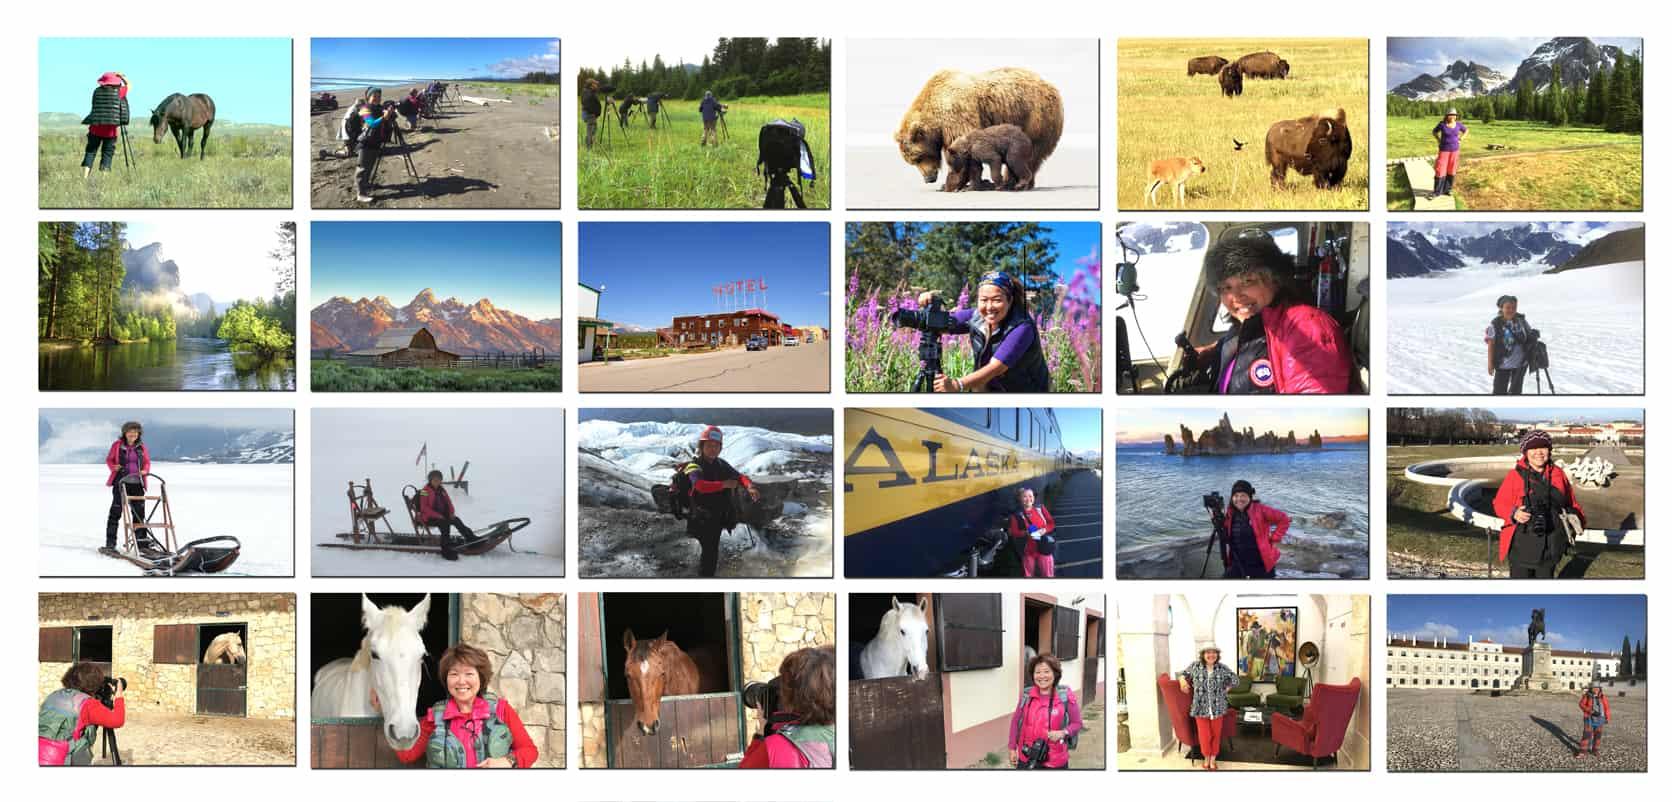 Alaska,-US-Canada TRAVEL POSTCARD- Dr Zenaidy Castro